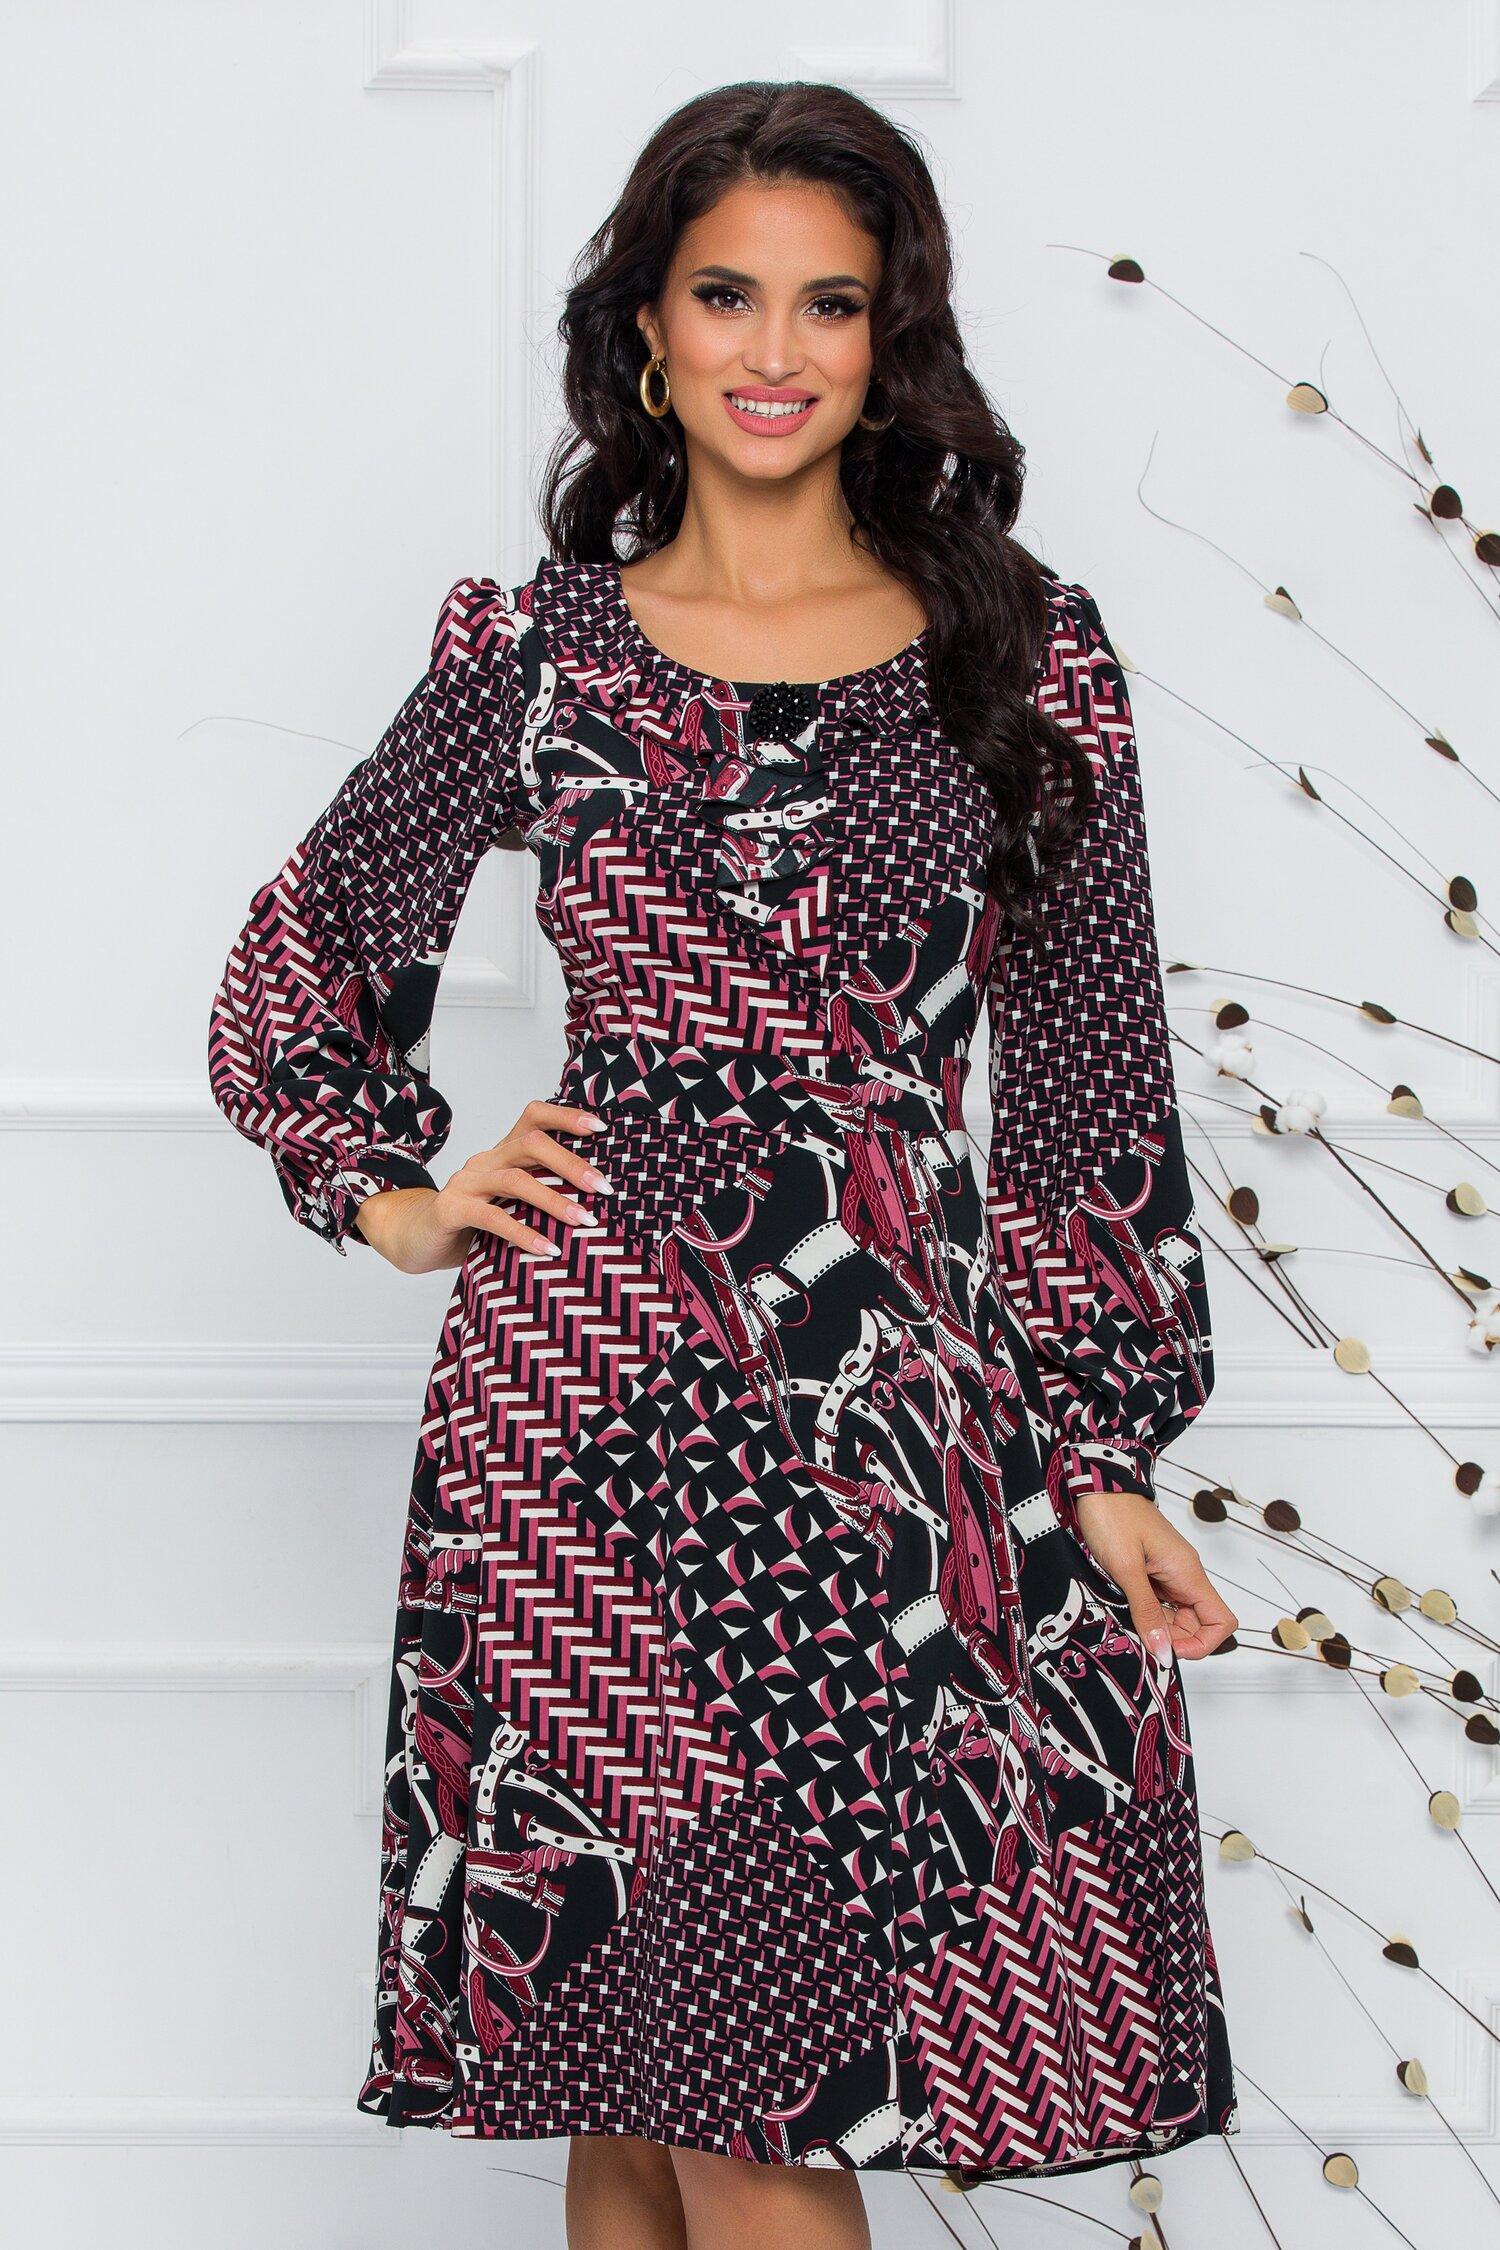 Rochie Mela neagra cu imprimeu divers in nuante de alb si bordo